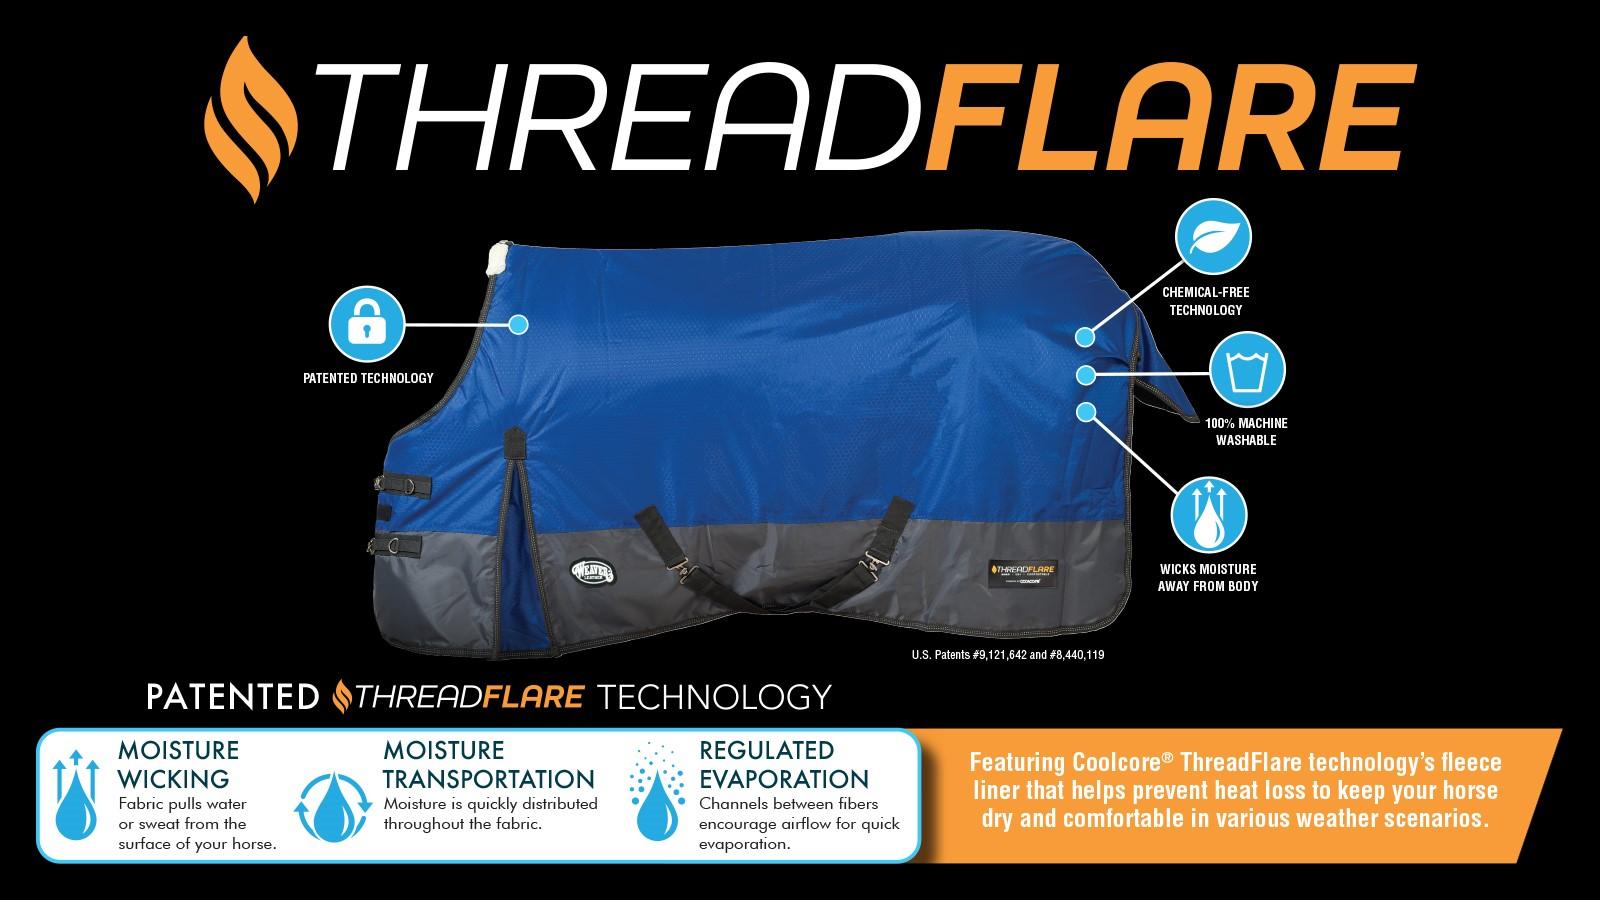 ThreadFlare blanket infographic